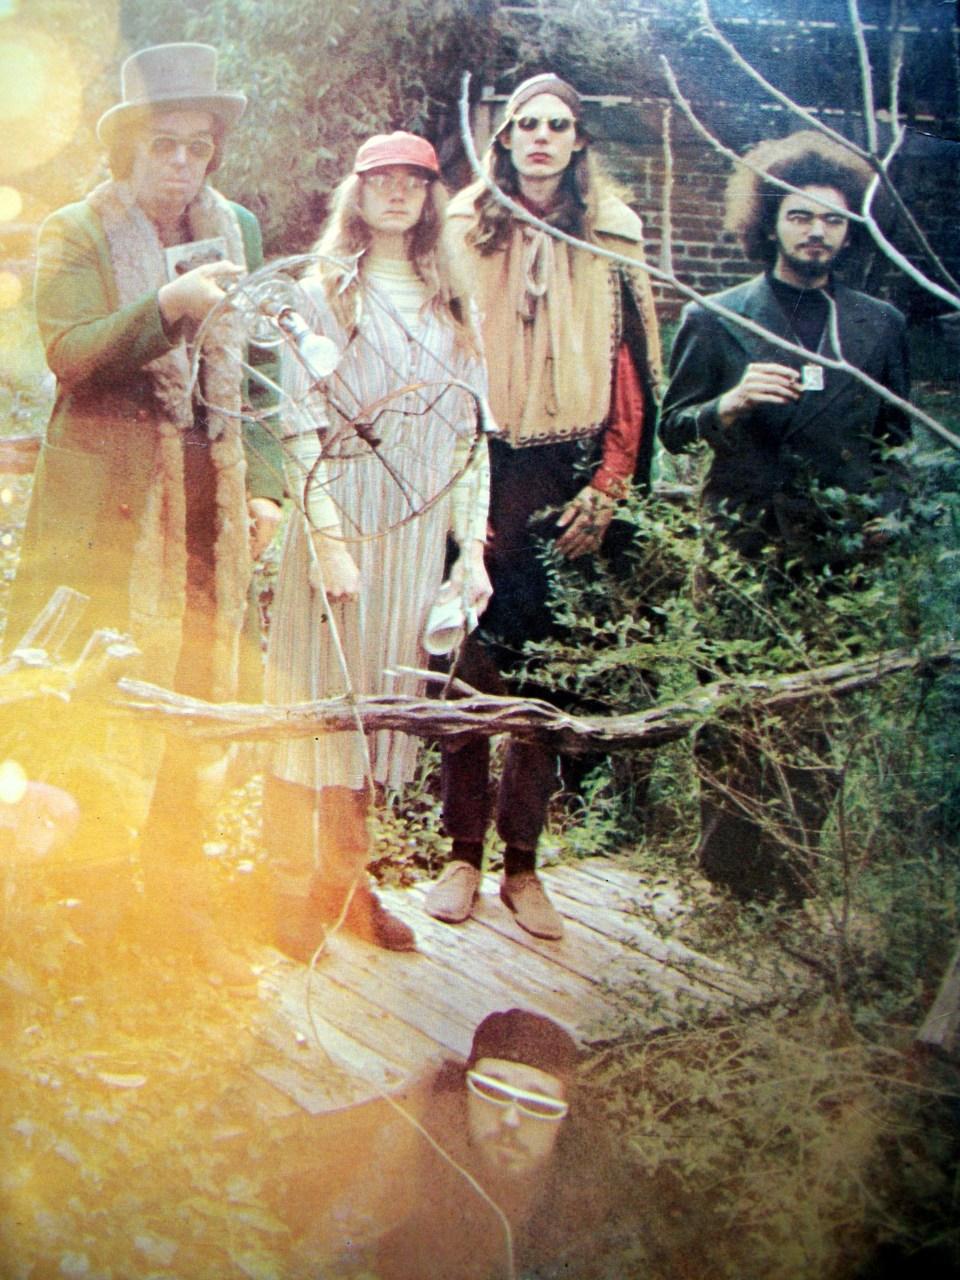 theswingingsixties :     Captain Beefheart and His Magic Band, 1969.